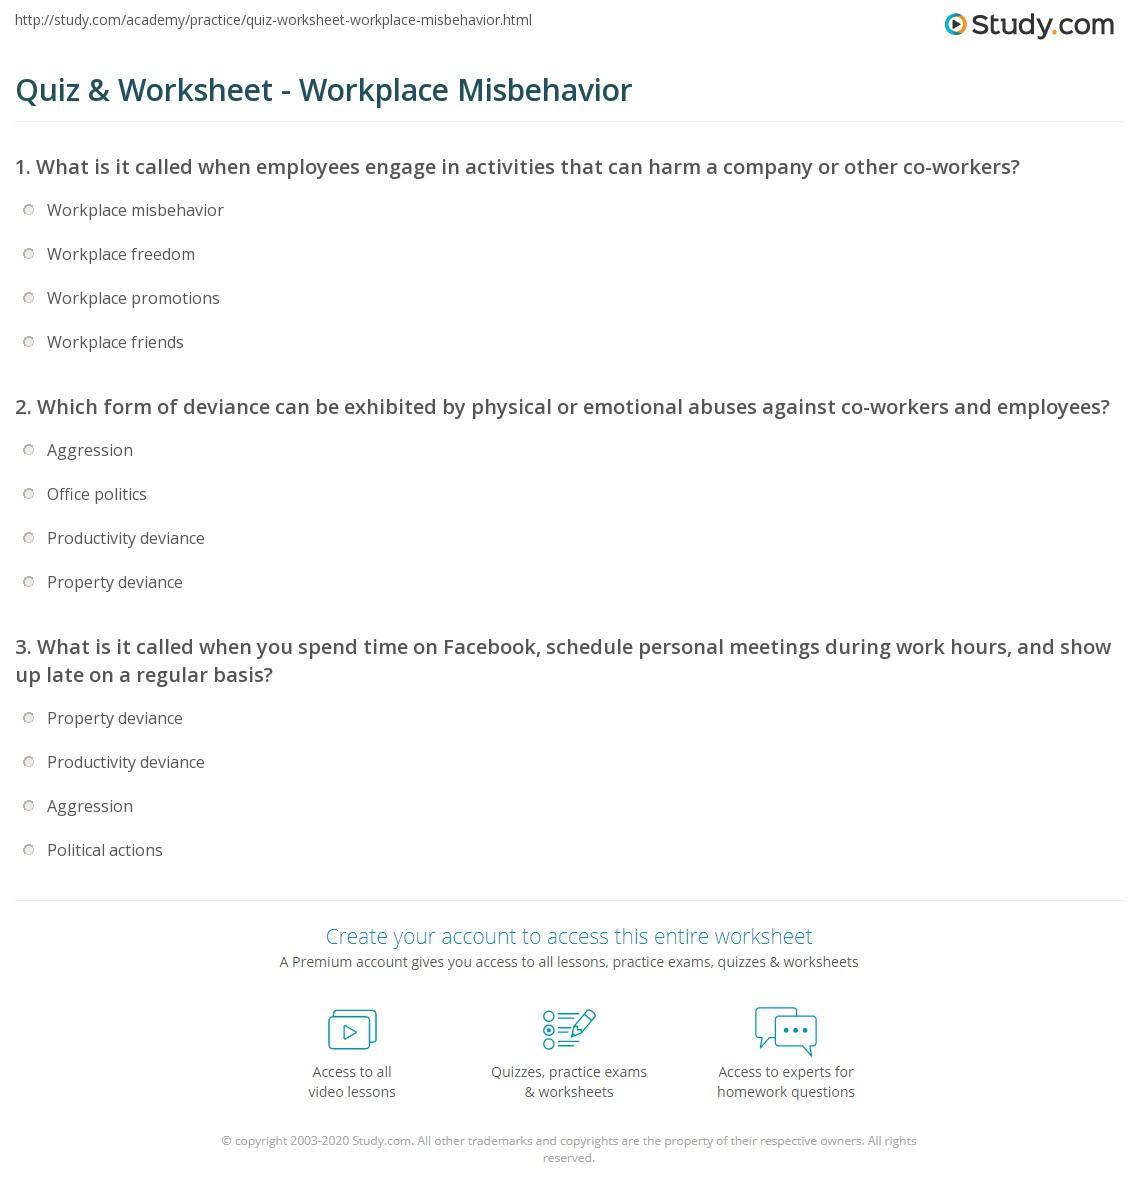 quiz worksheet workplace misbehavior com print workplace misbehavior deviance aggression political behavior worksheet